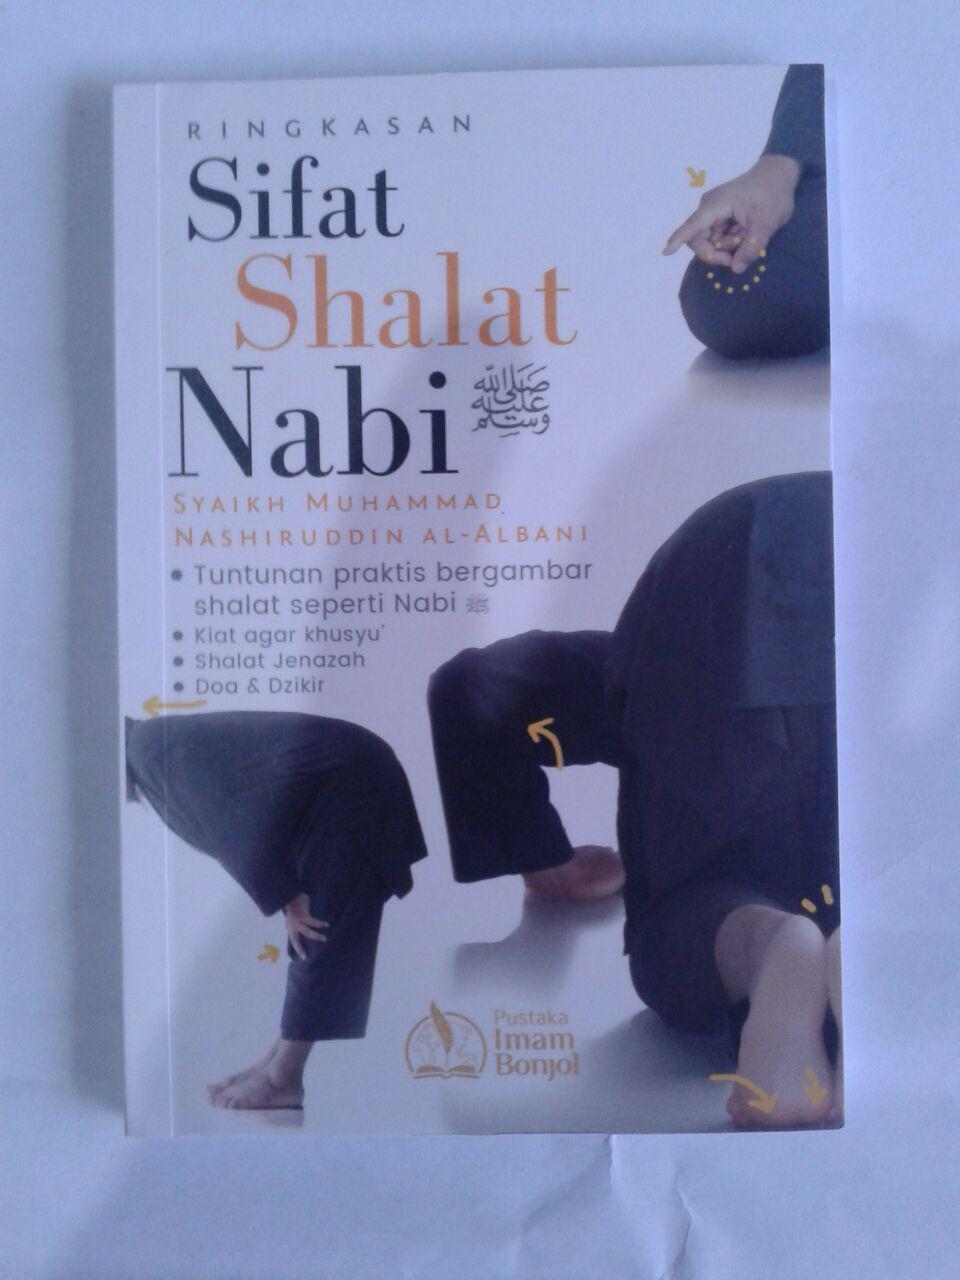 Buku Ringkasan Sifat Shalat Nabi Syaikh Al-Albani cover 2